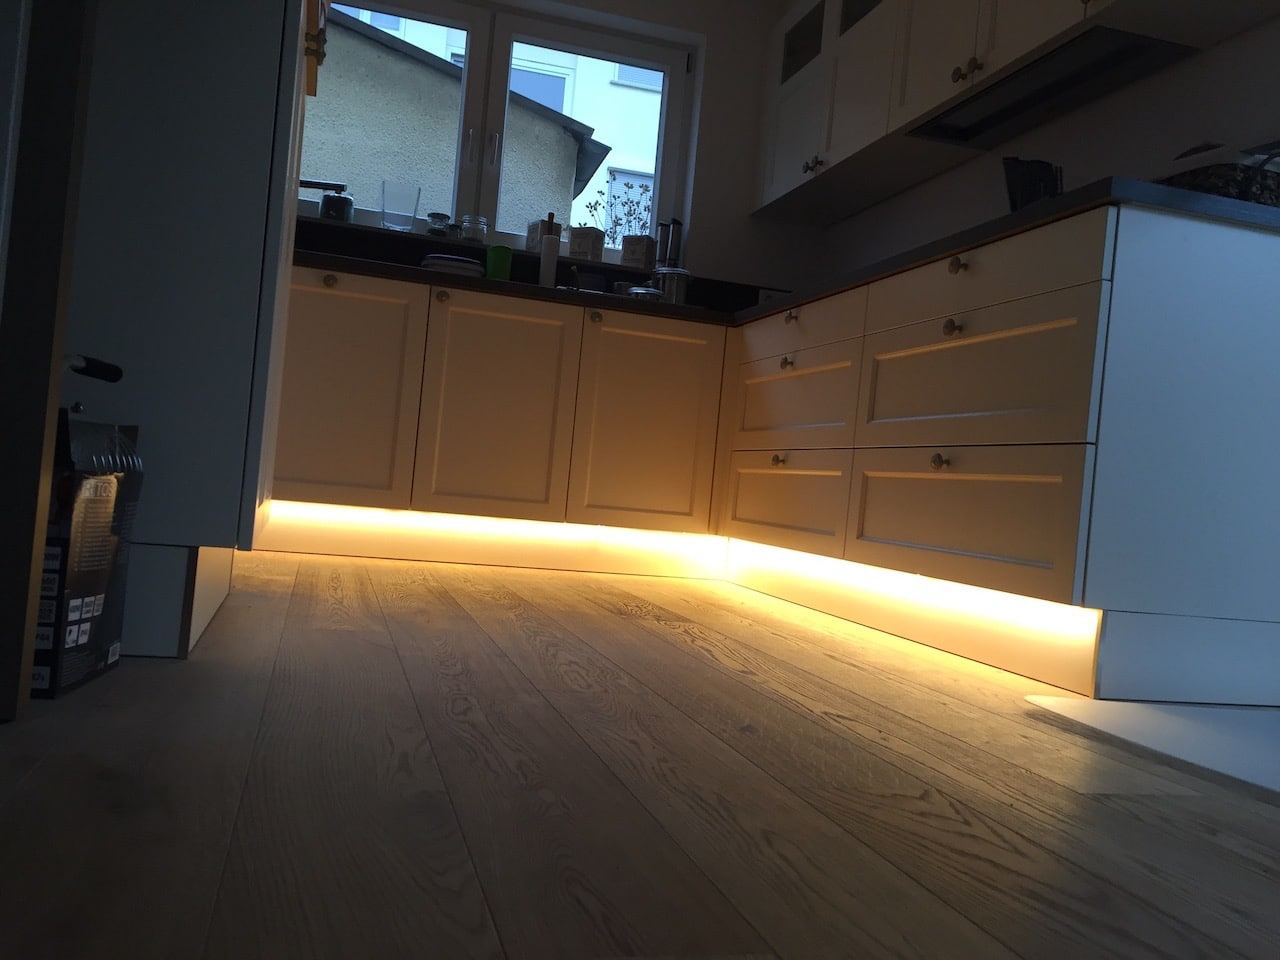 Küchenblockbeleuchtung